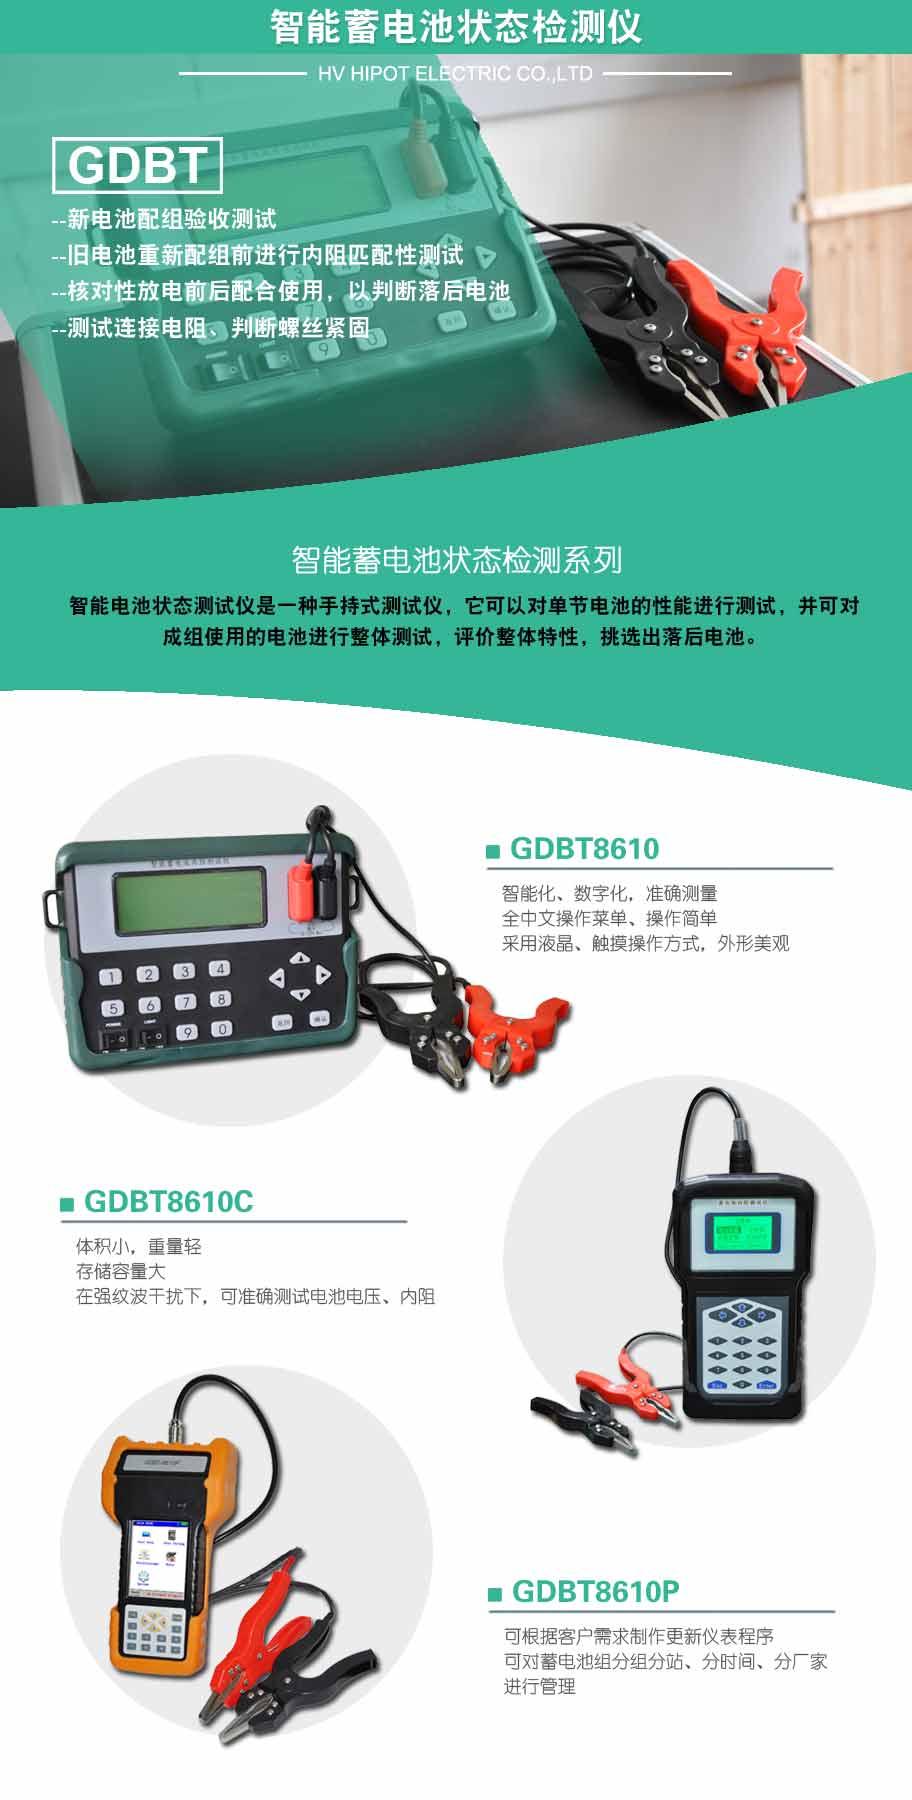 GDBT-8610C 智能蓄电池内阻测试仪